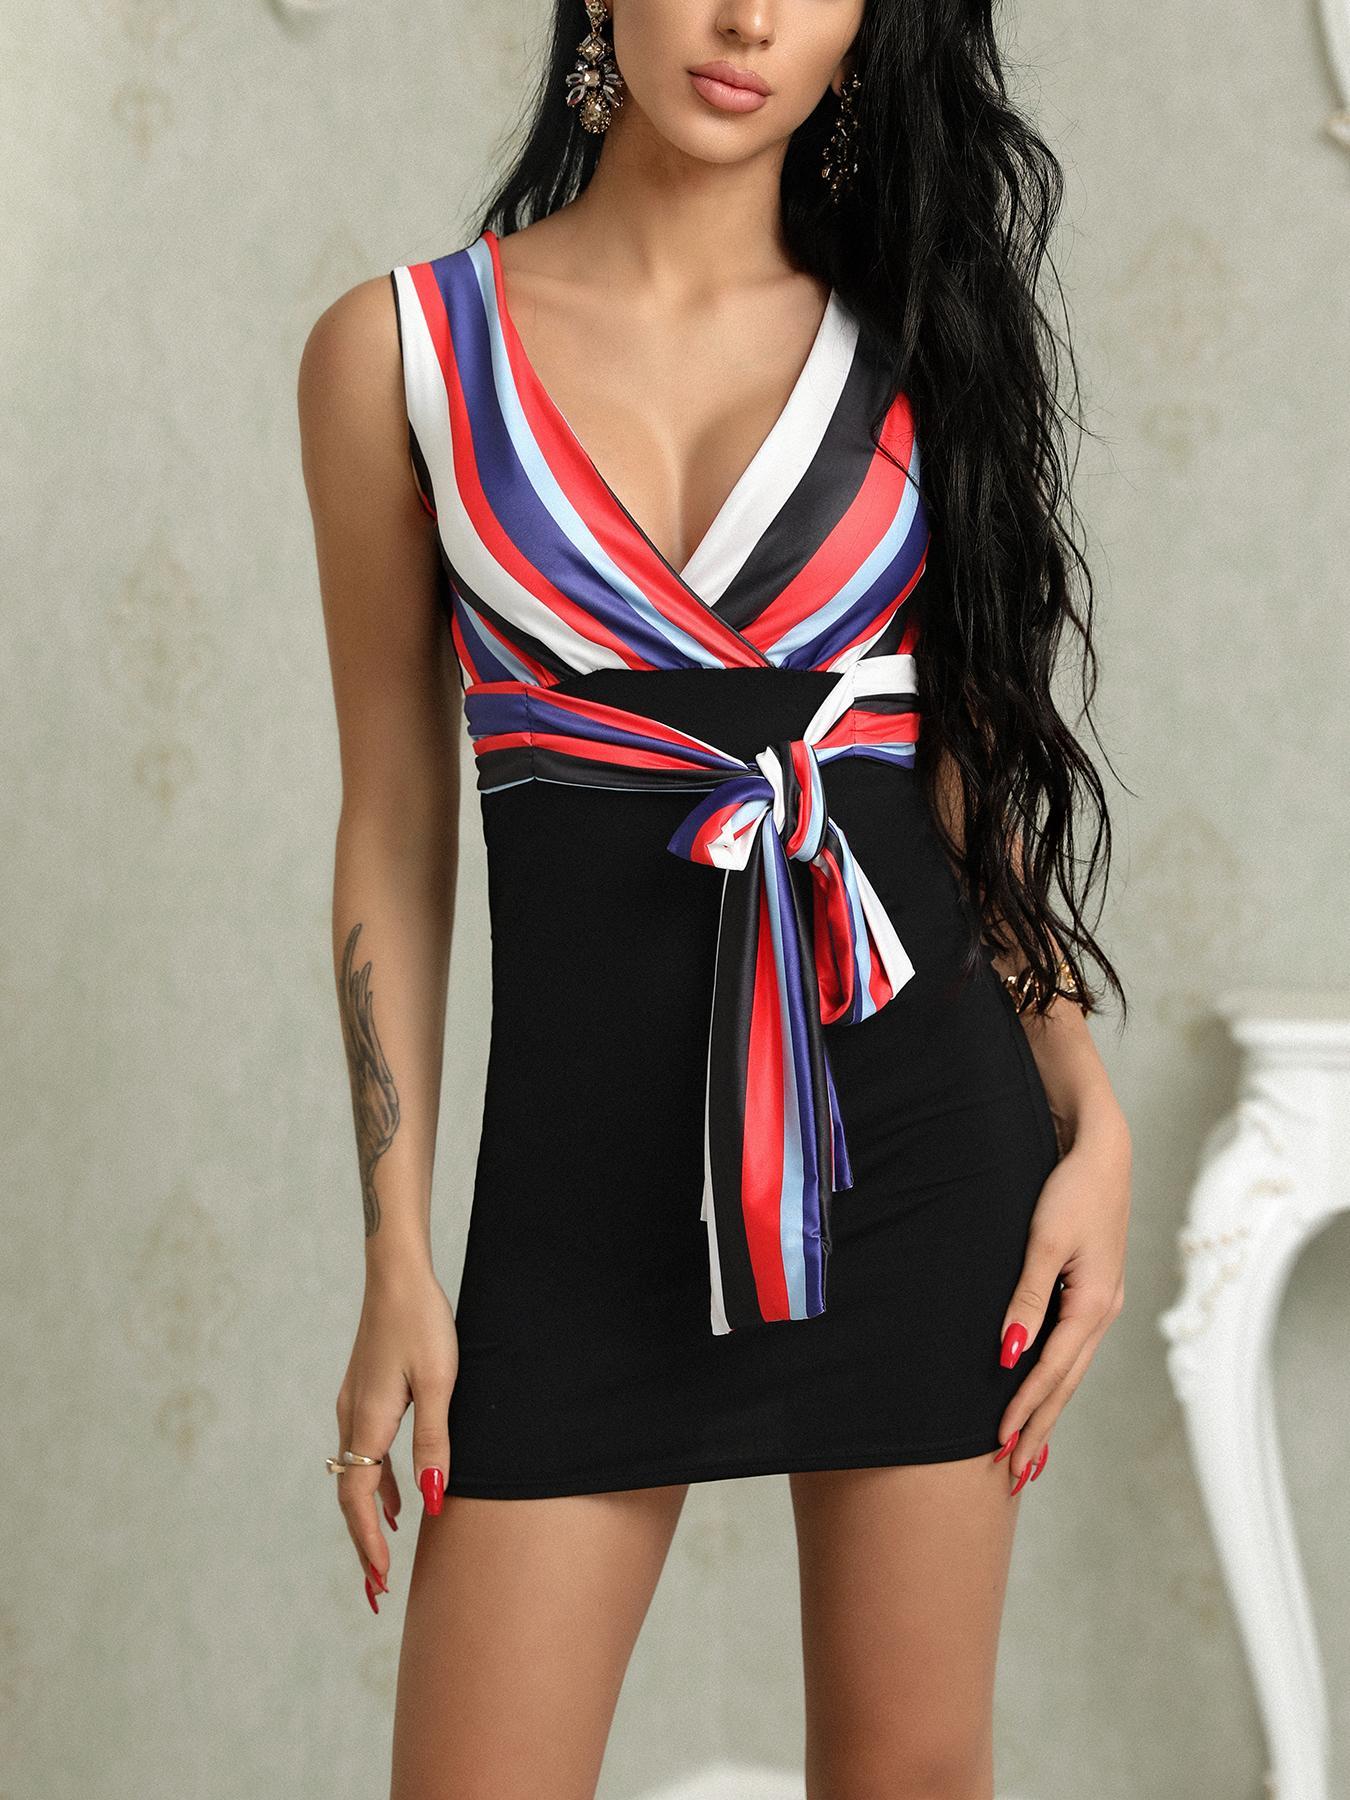 boutiquefeel / Listras Coloridas Envolto Mini vestido com cinto